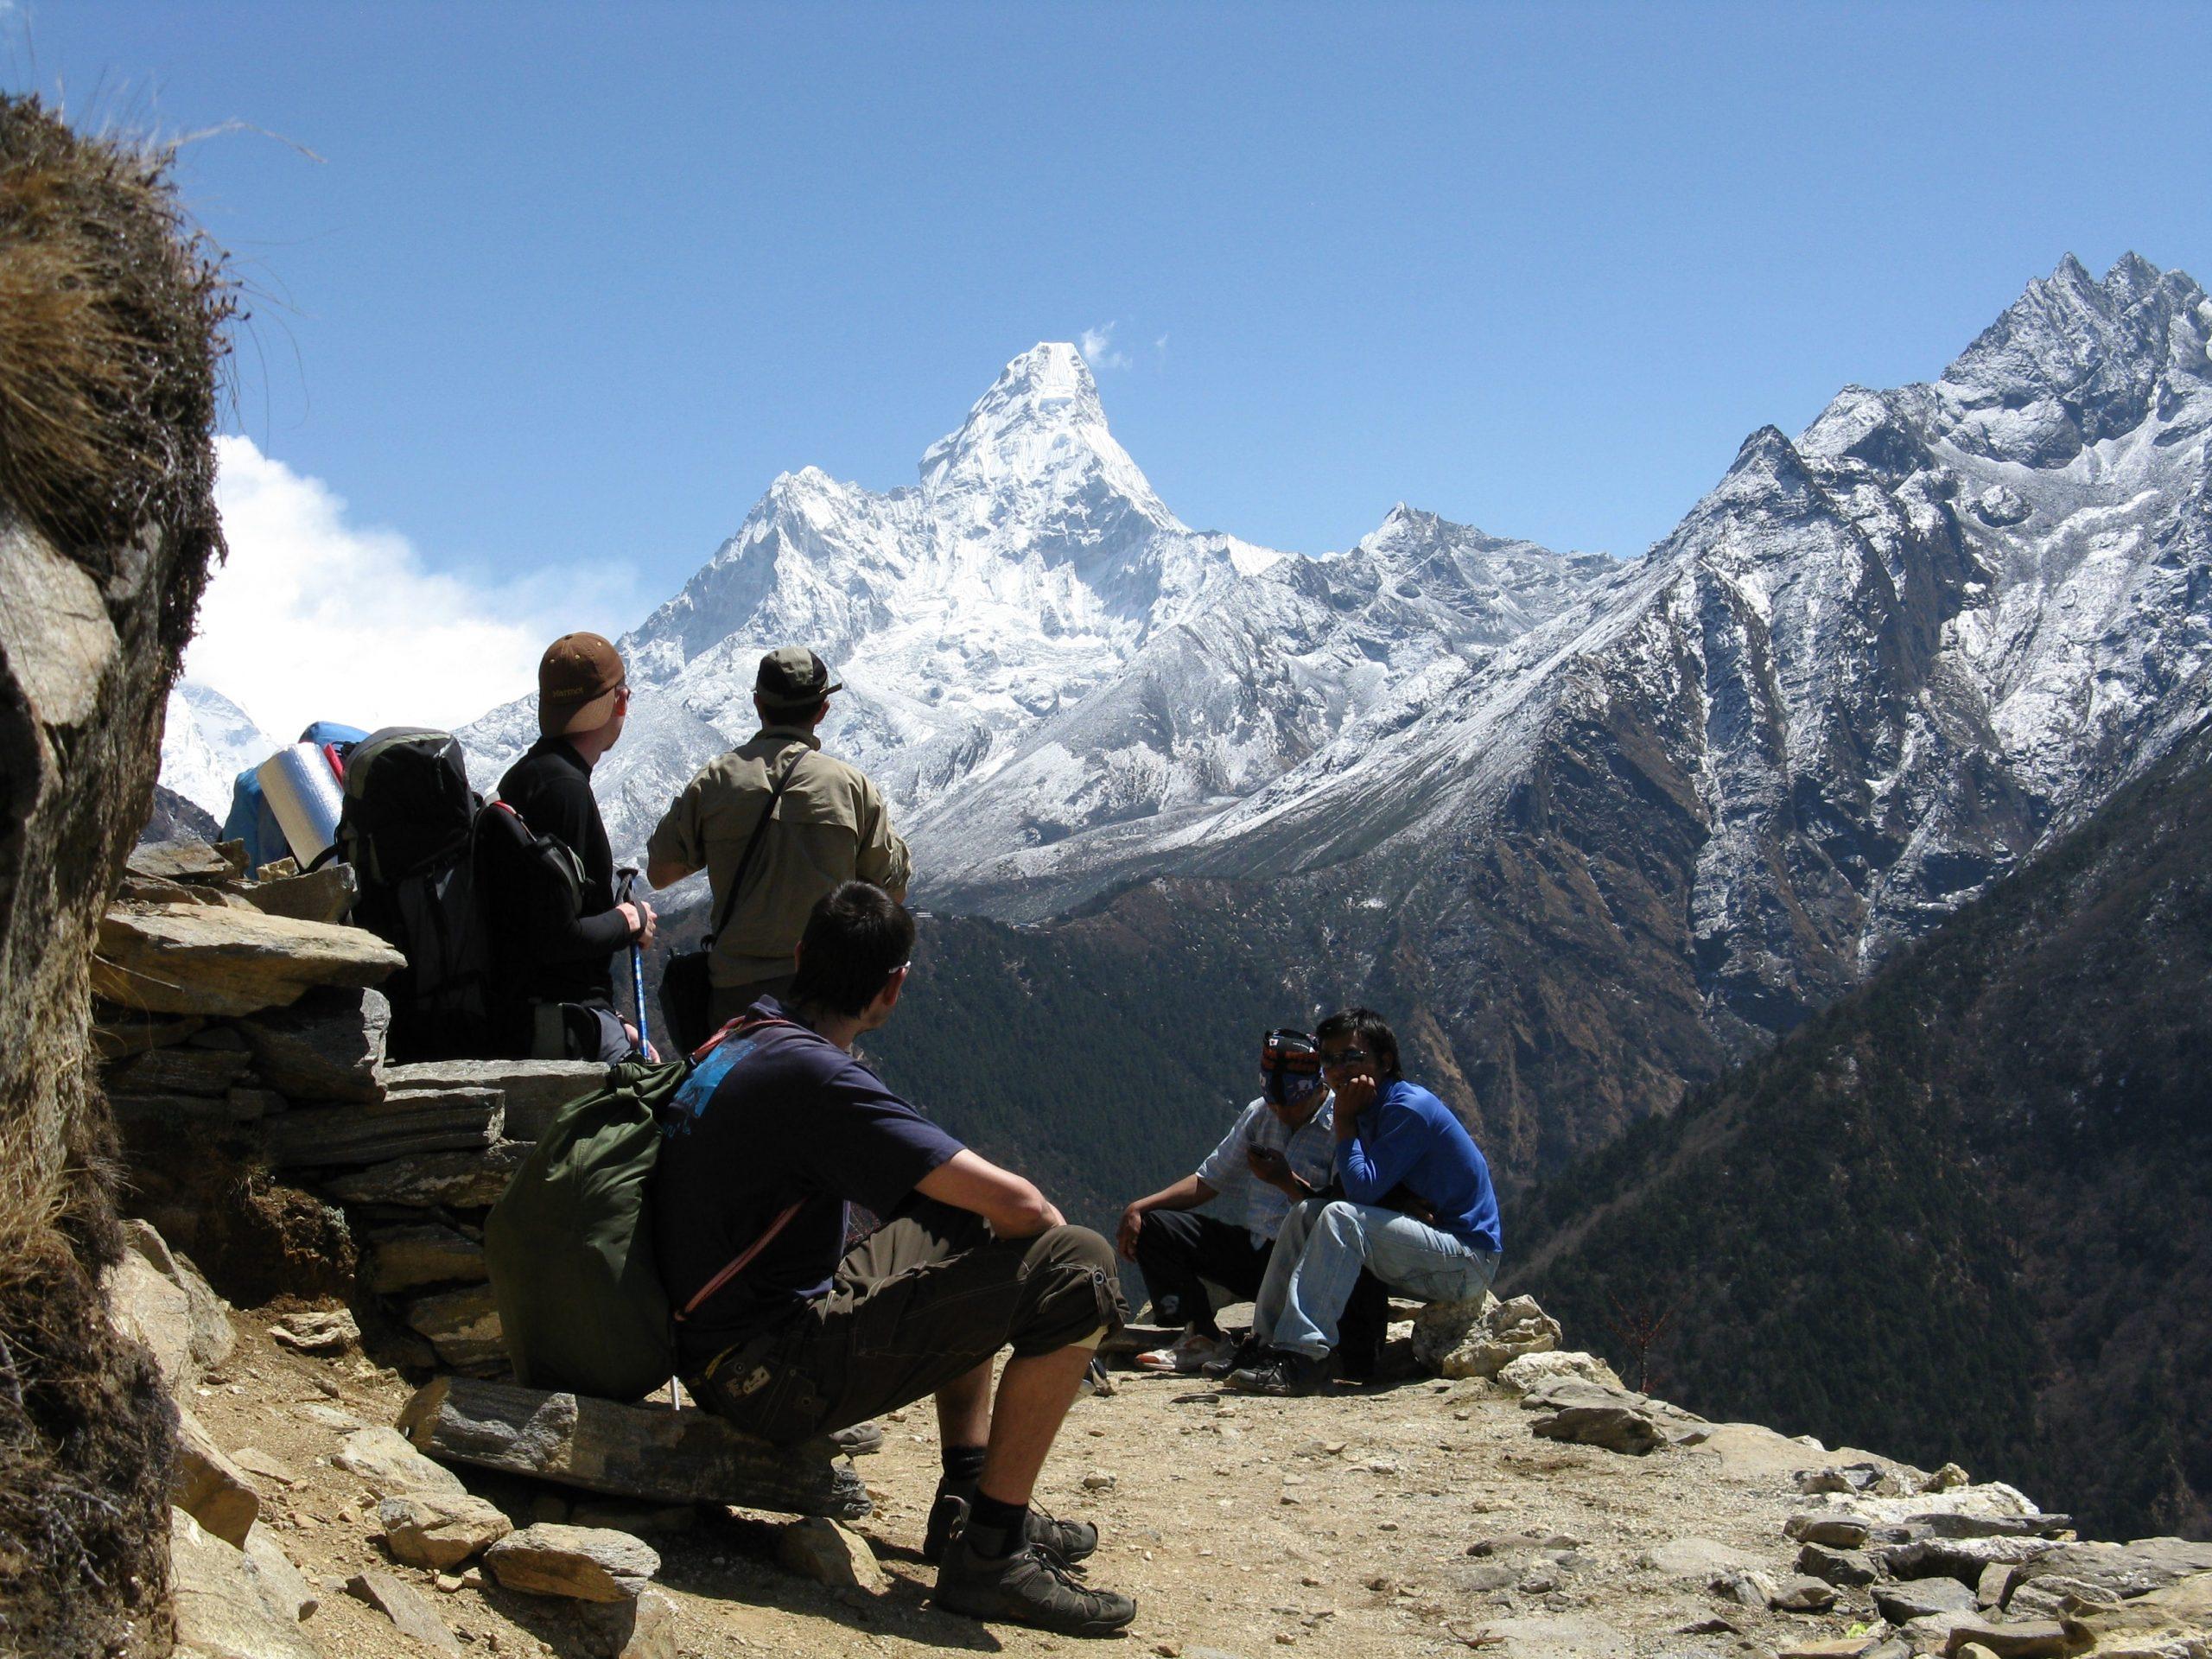 hikers taking a break on the trail following trail etiquette